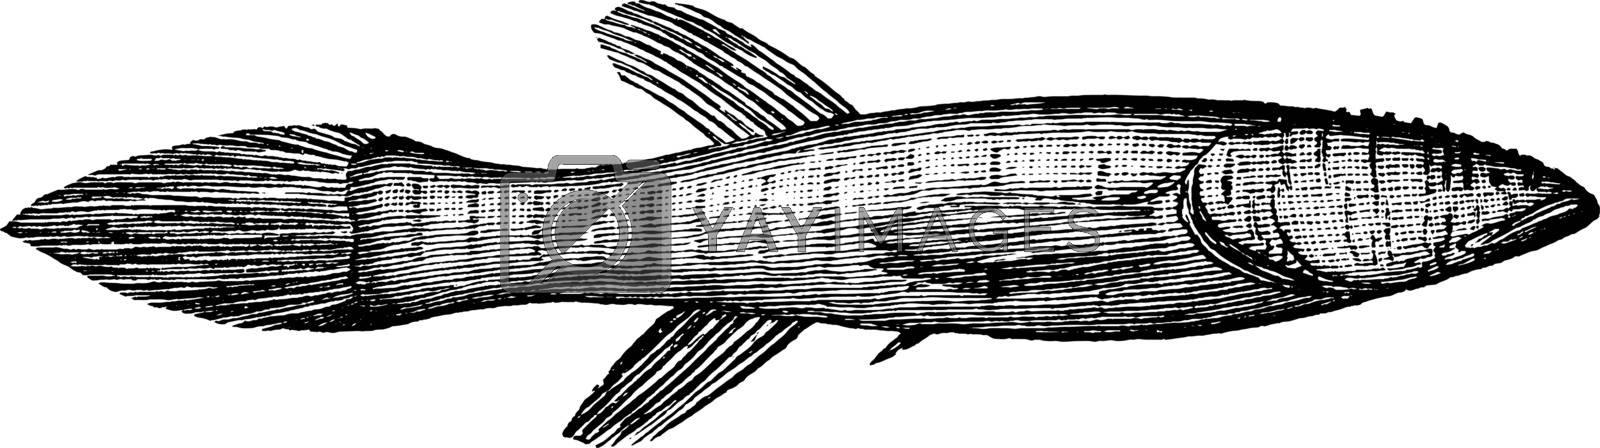 Blindfish, vintage illustration. by Morphart